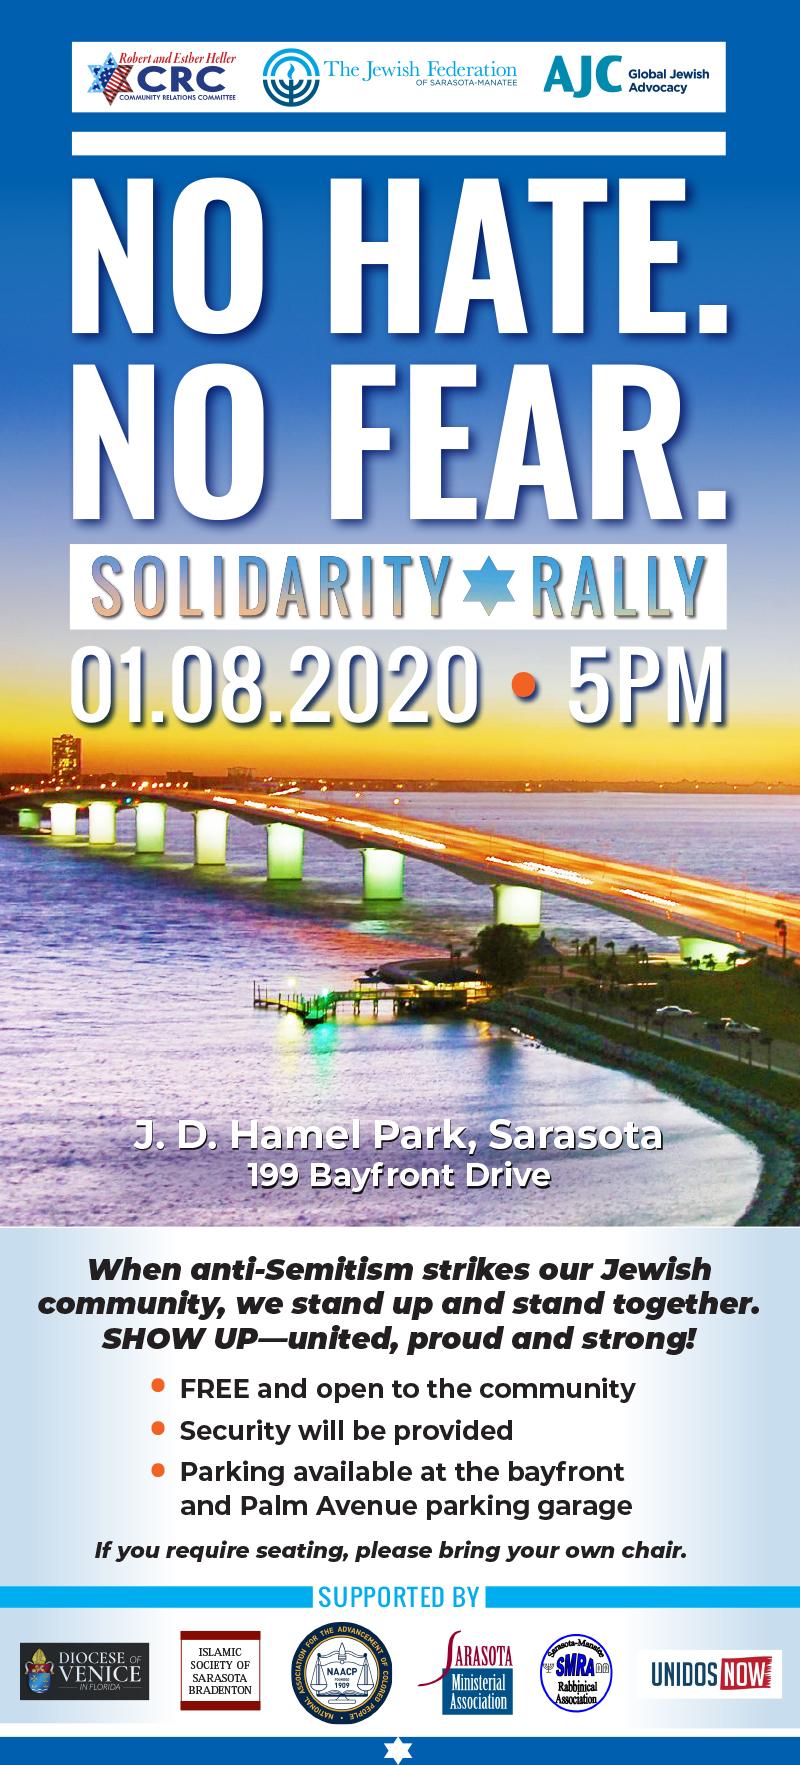 jewish_no-hate-no-fear-rally-sarasota-information-graphic